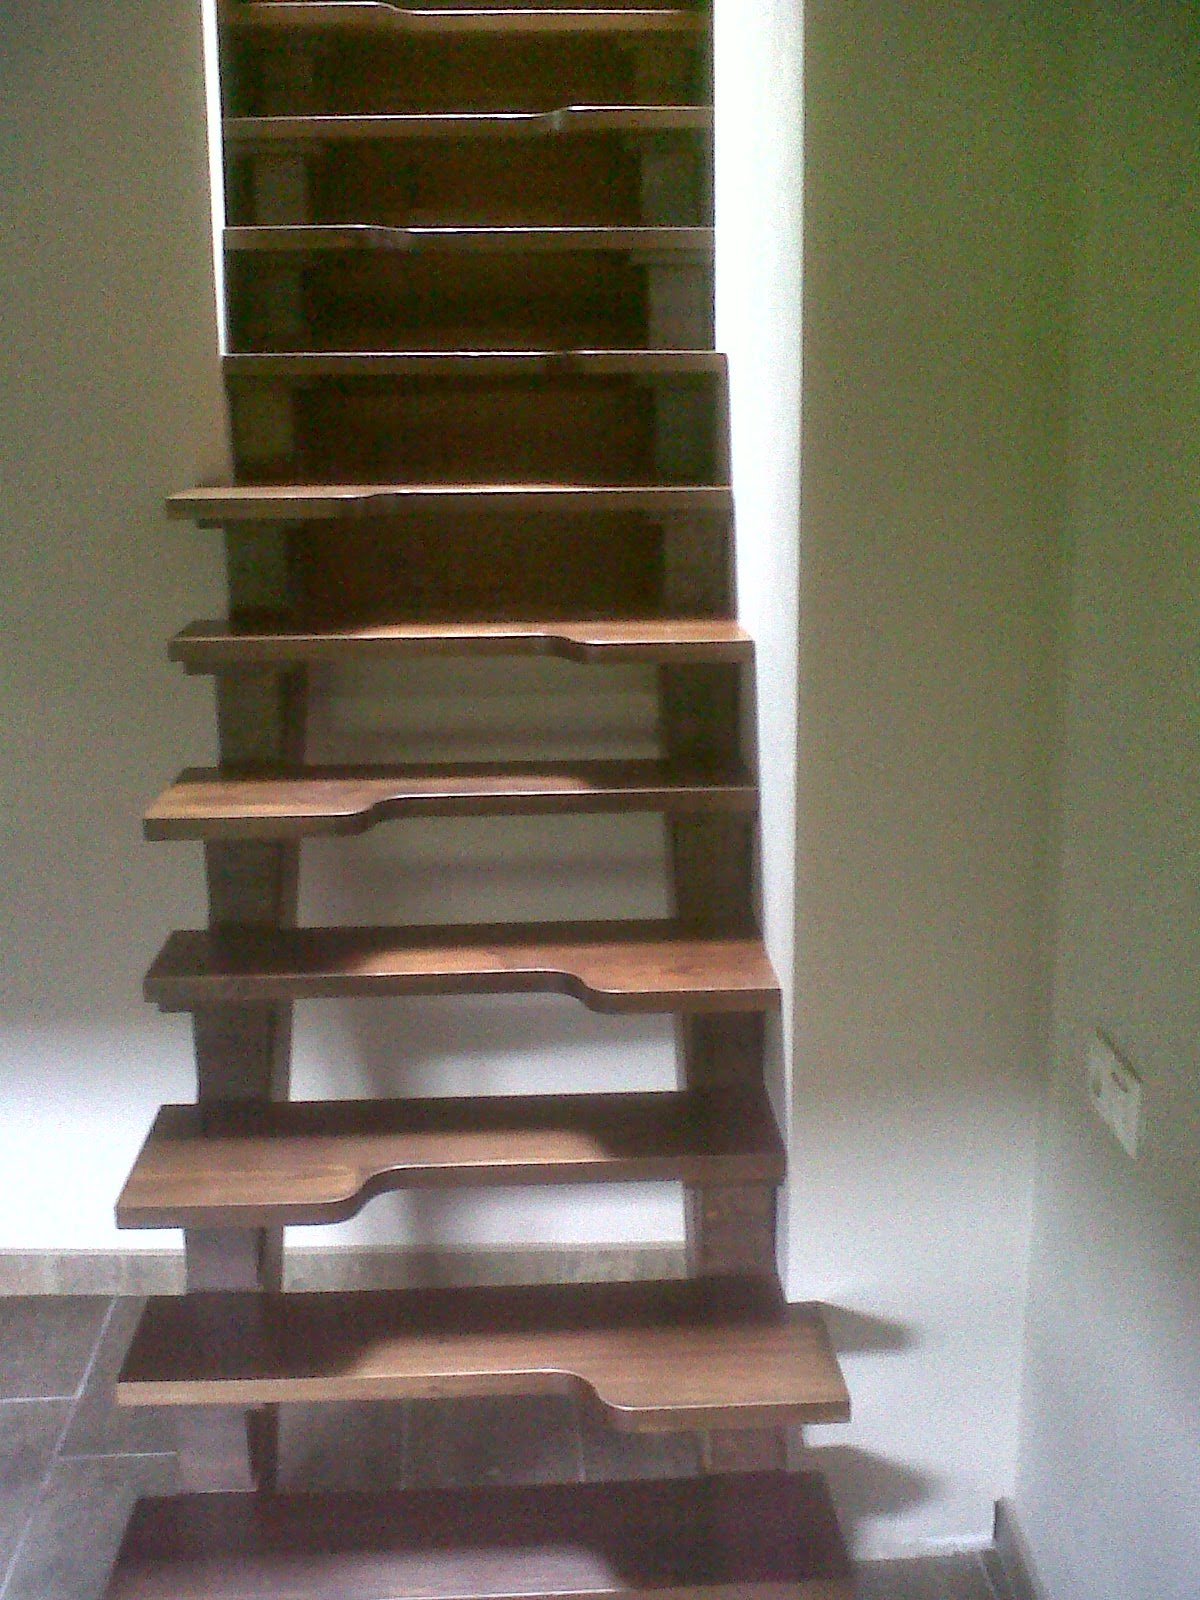 Carpinteria viosca roda escalera con pelda os reducidos - Escaleras con peldanos de madera ...